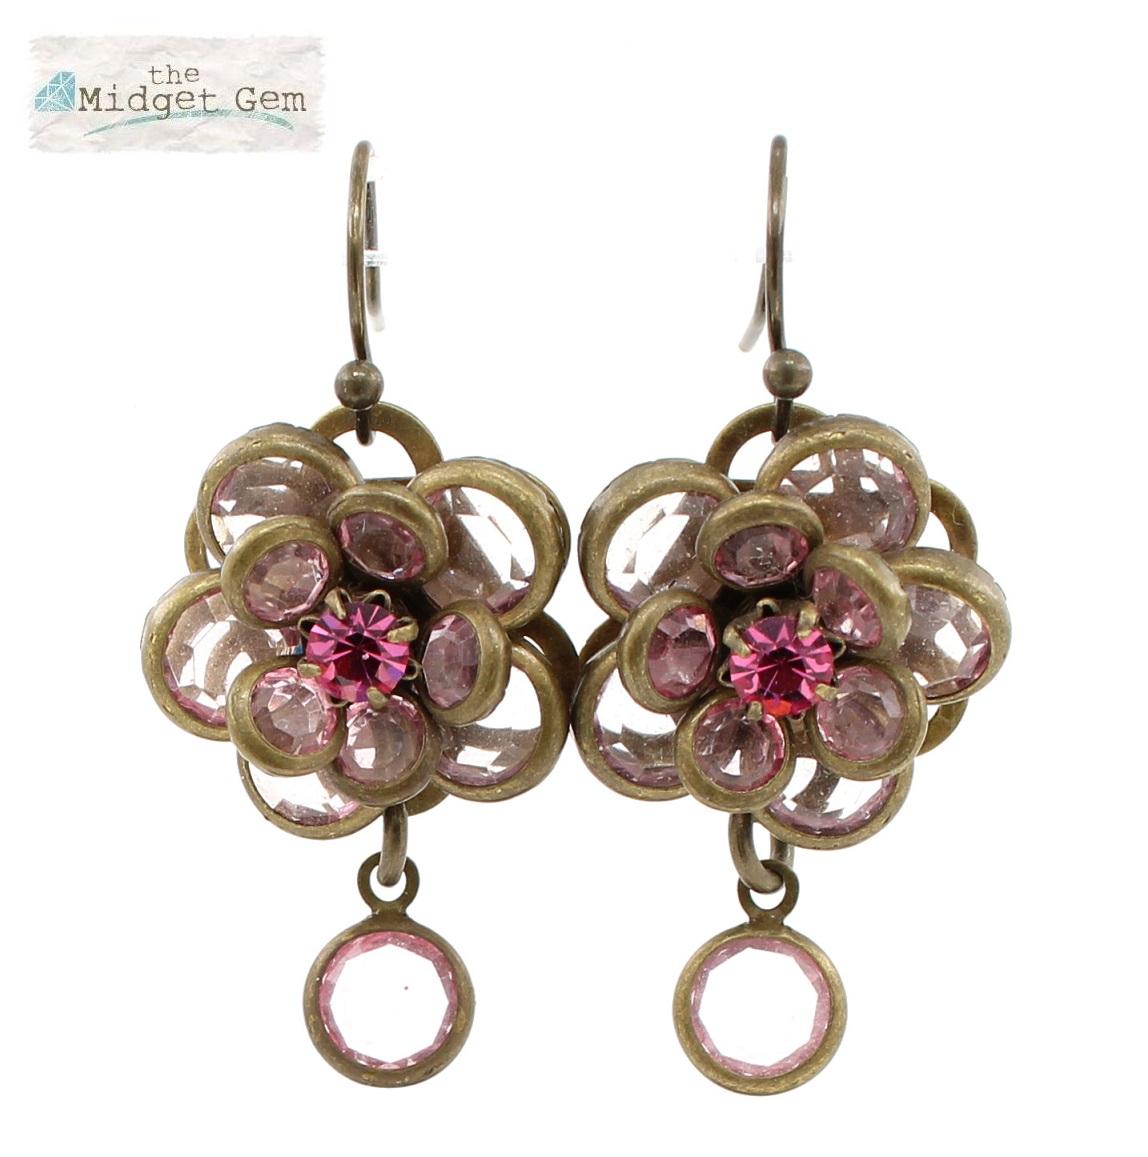 Lisbeth Dahl - Faceted Discs Flower Earrings - Vintage Gold/Pink BNWT